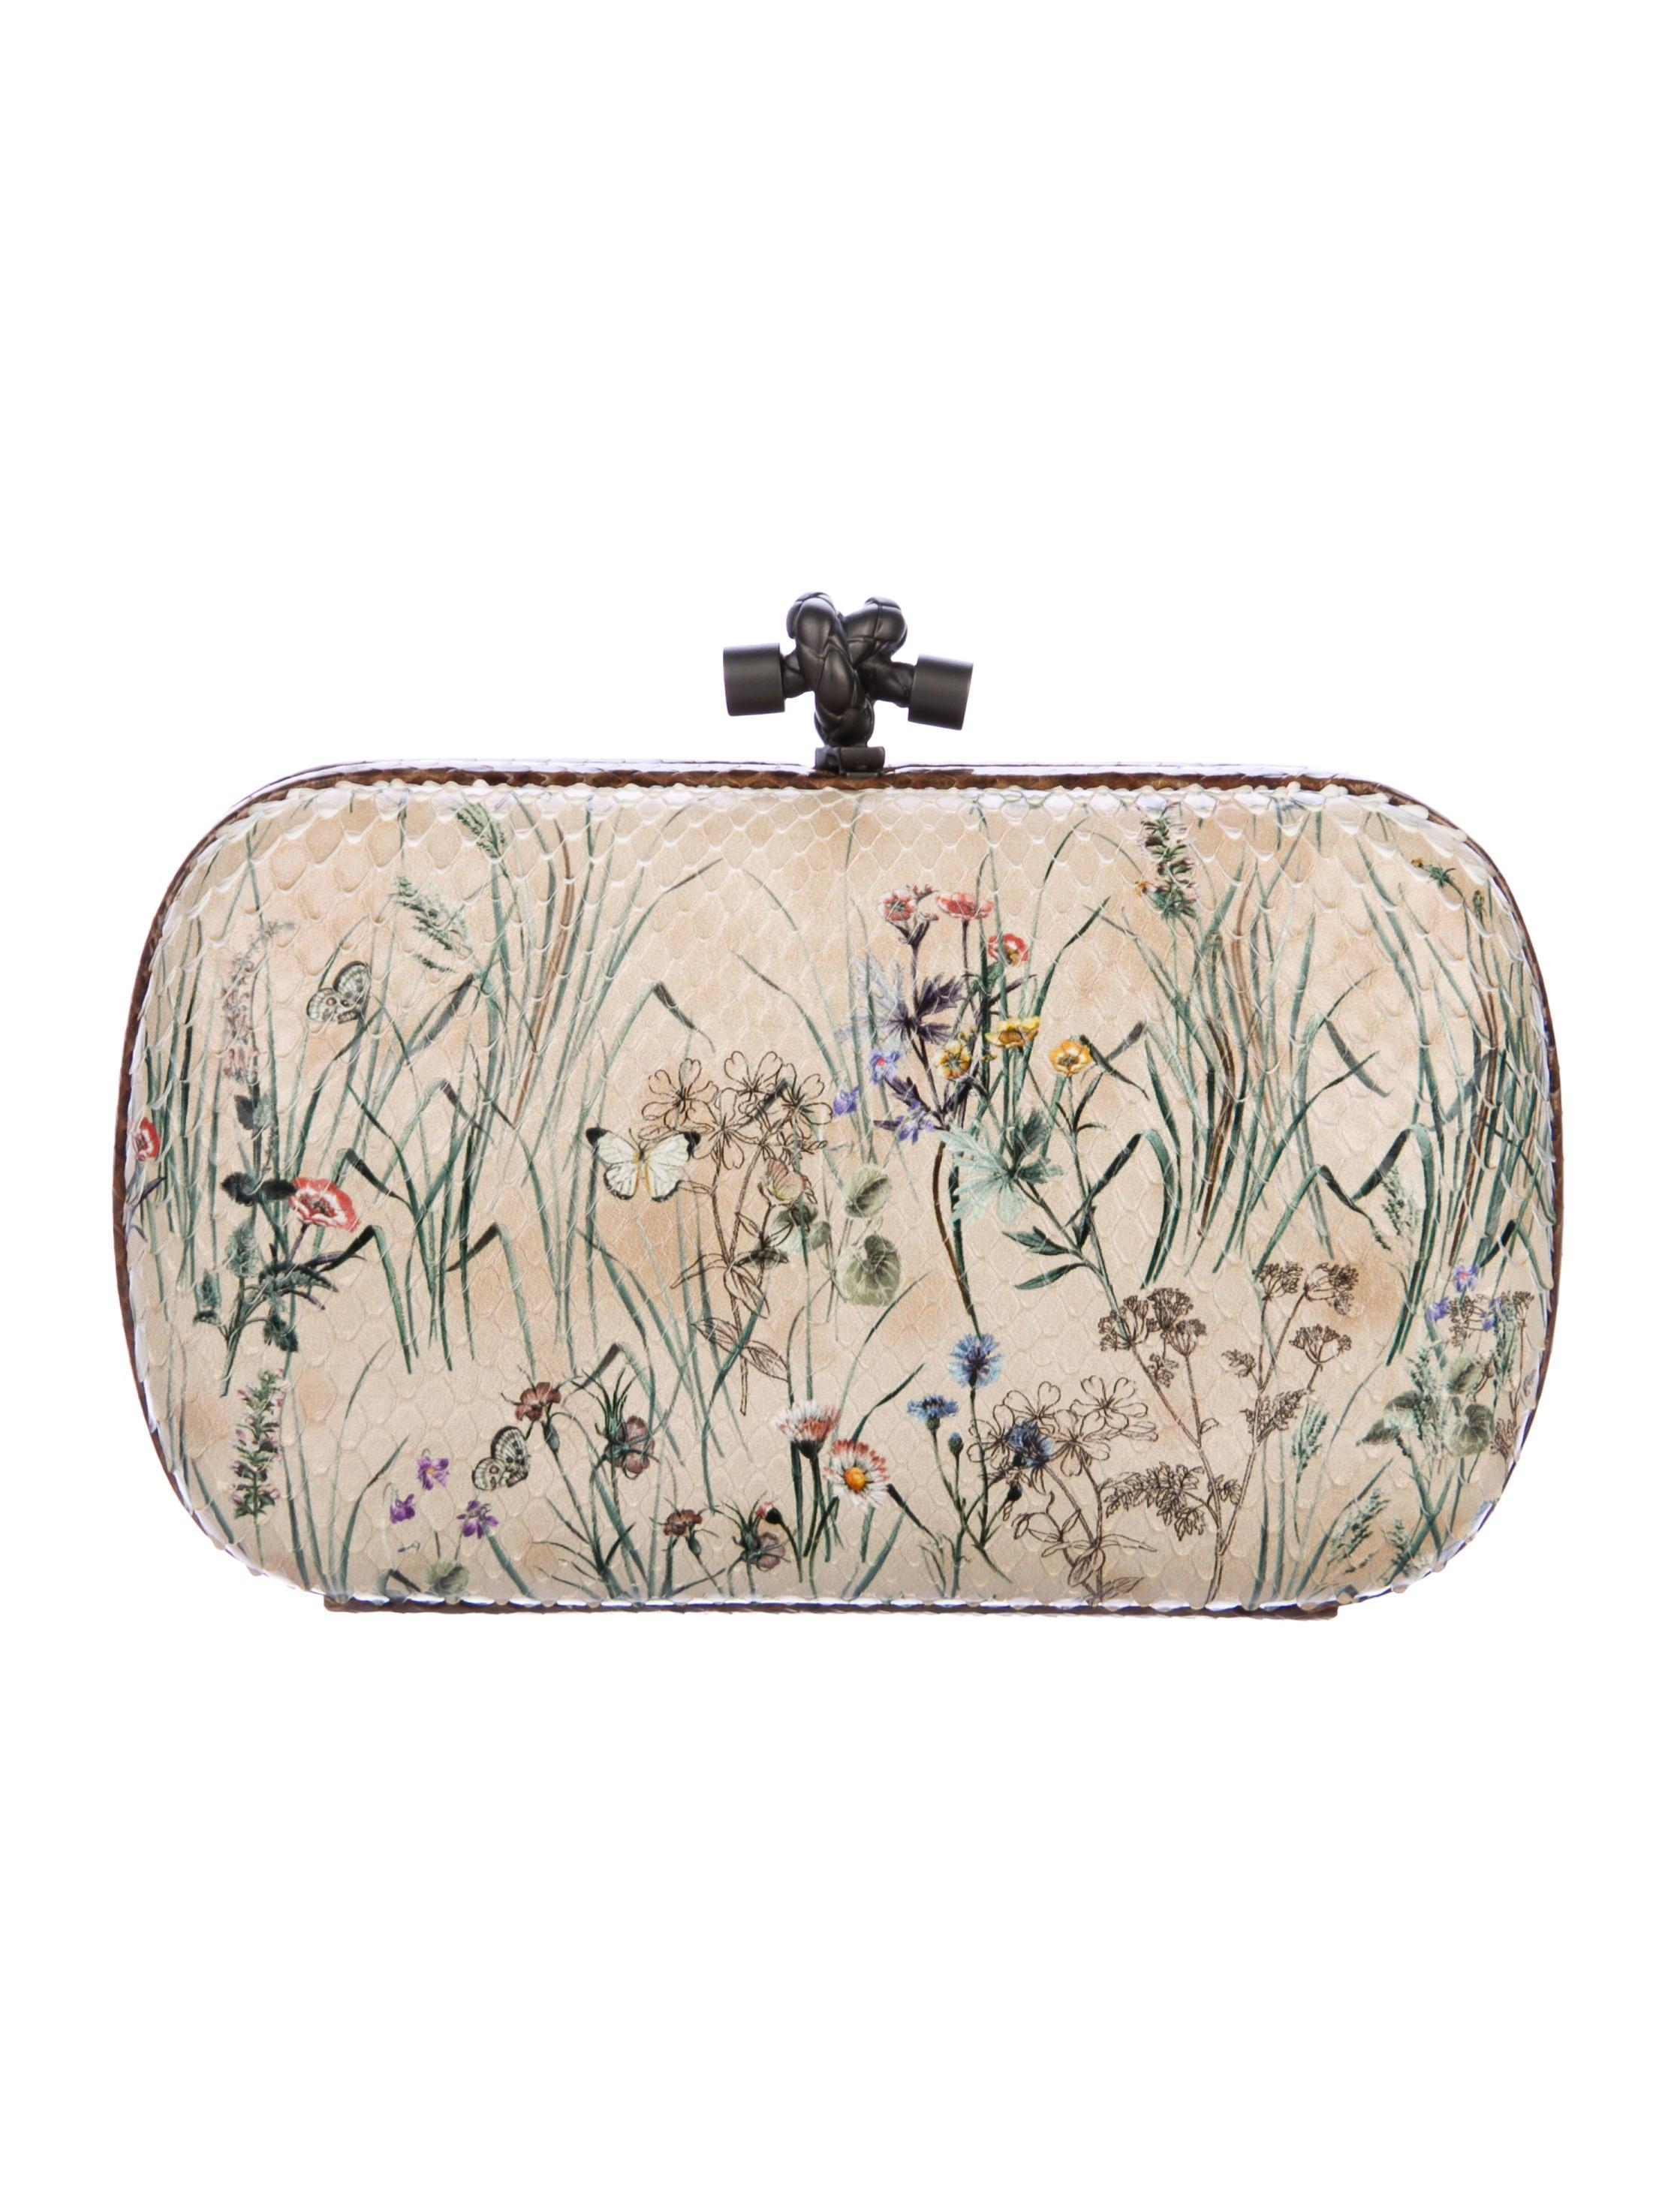 Bottega Veneta Python Knot Clutch - Handbags - BOT60912  ee00672904ef0